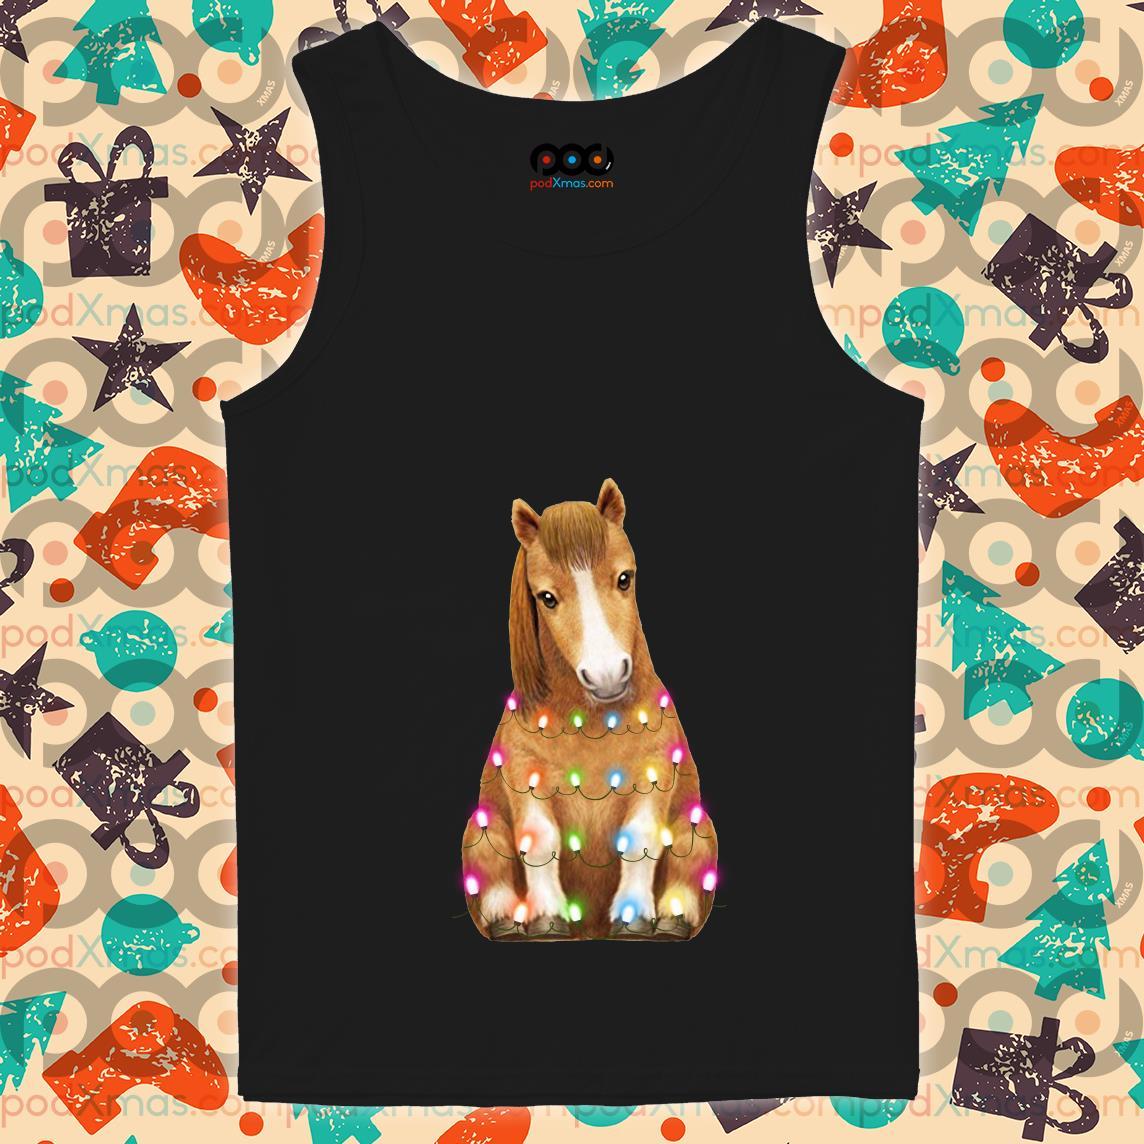 Horse Little Pony Light Christmas tank top